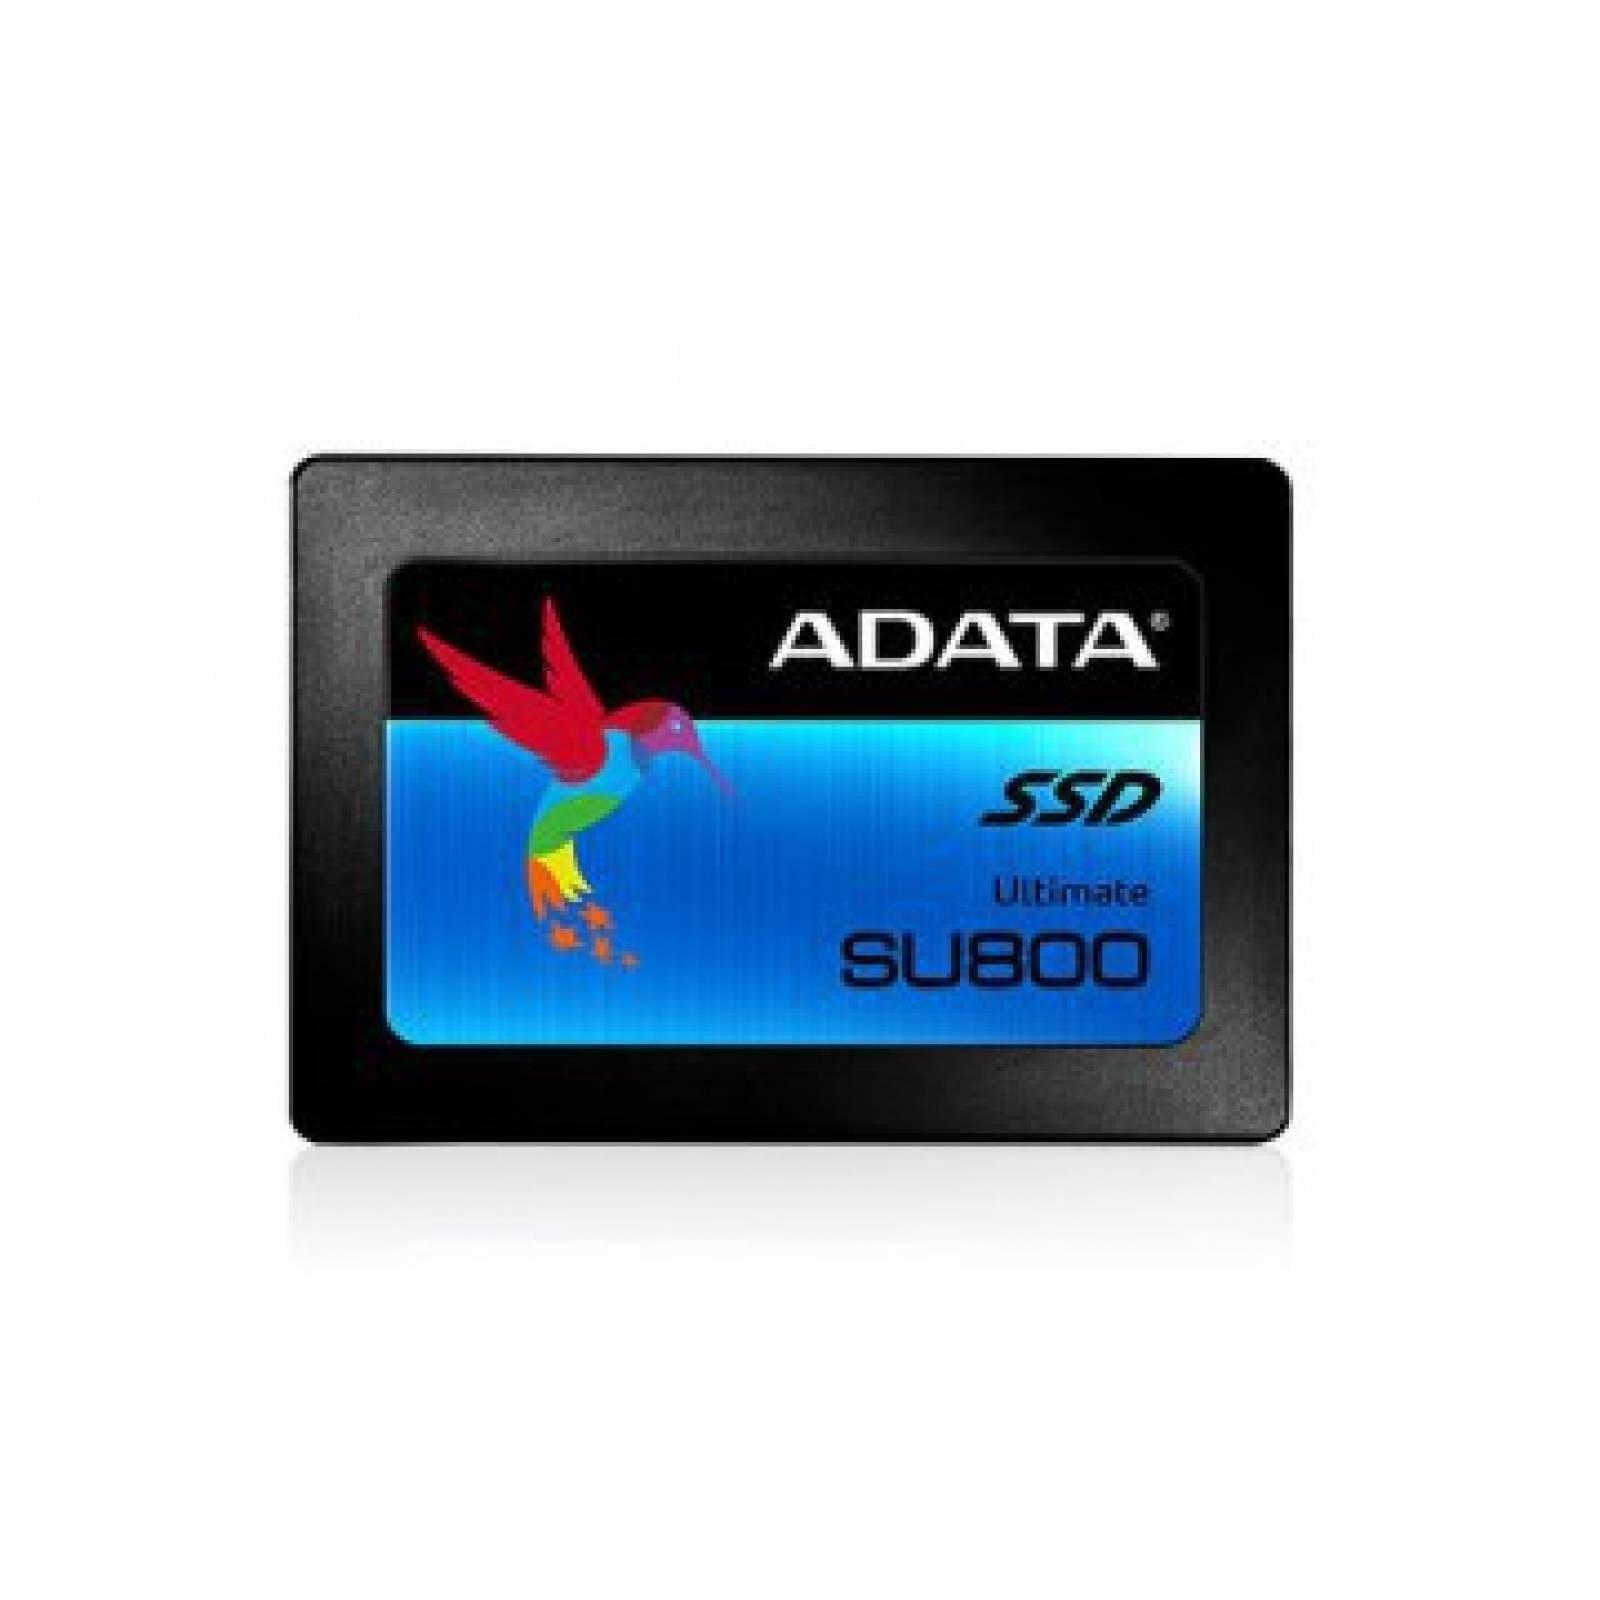 SSD Adata Ultimate SU800 512GB SATA III 2.5 7mm